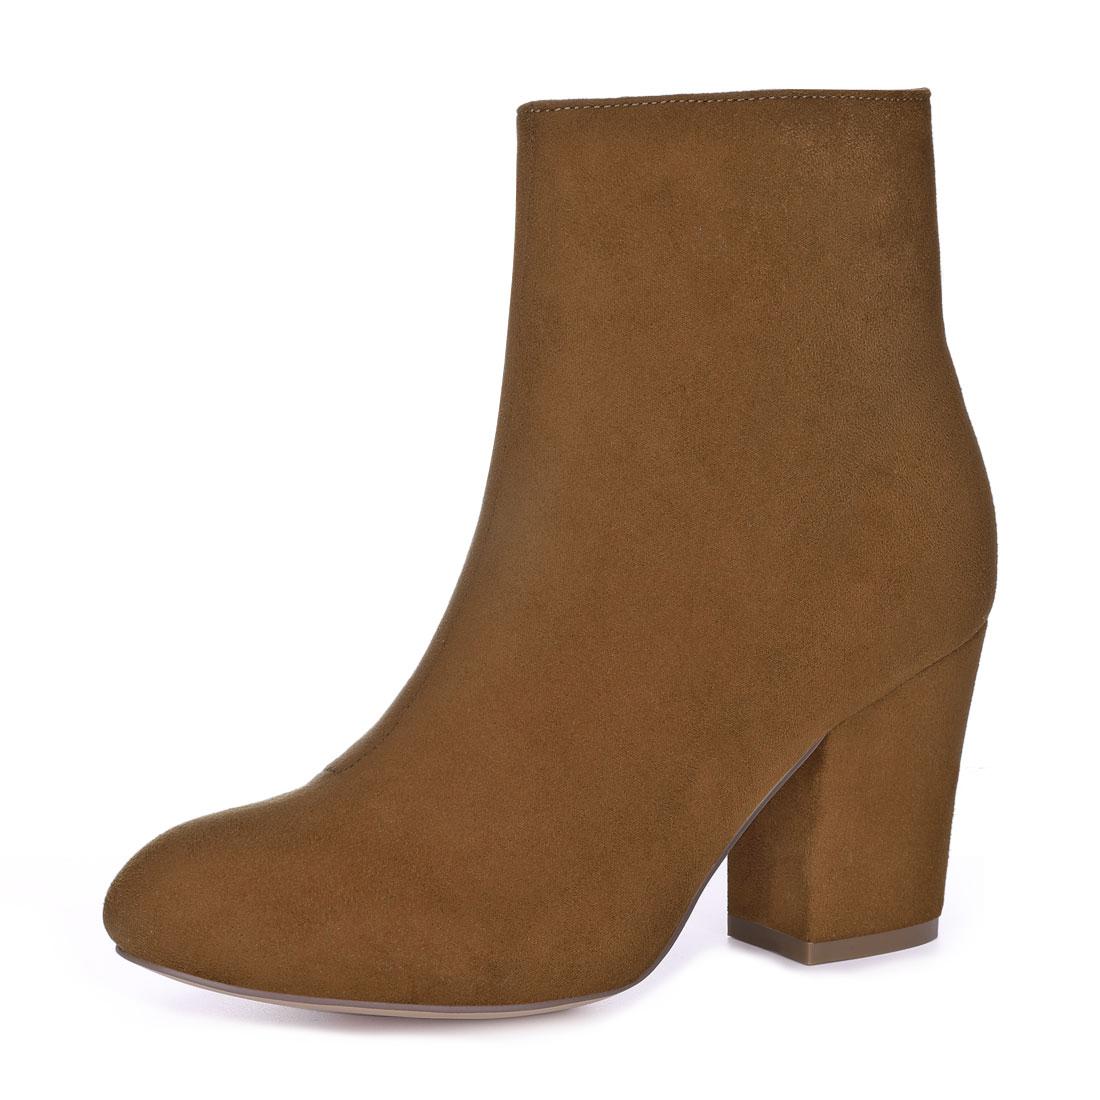 Allegra K Women Round Toe Side Zipper Block Heel Ankle Boots Brown US 7